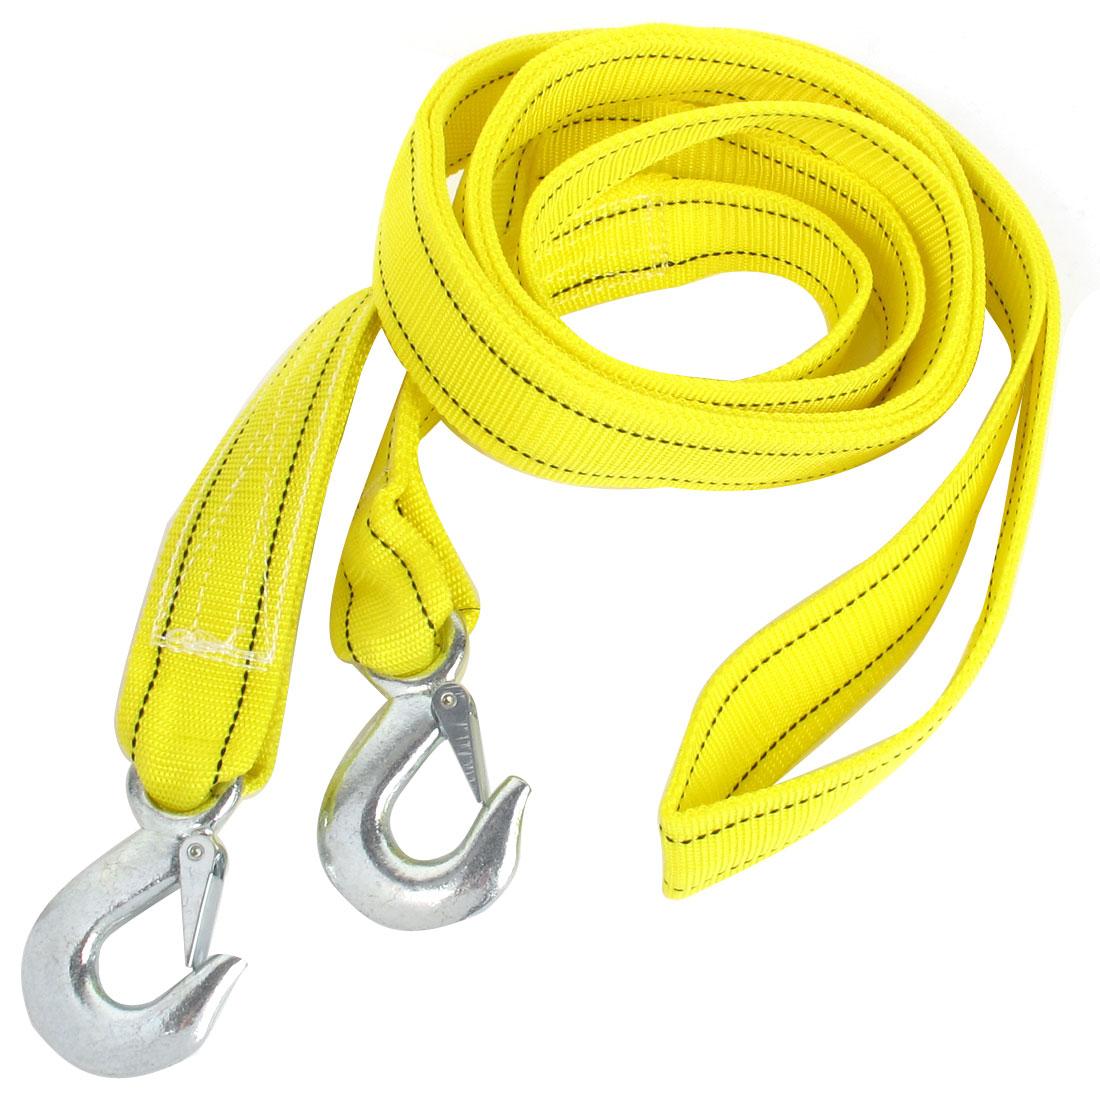 Truck Yellow Nylon 5 Tons Capacity Emergency Nylon Towing Strap 5M